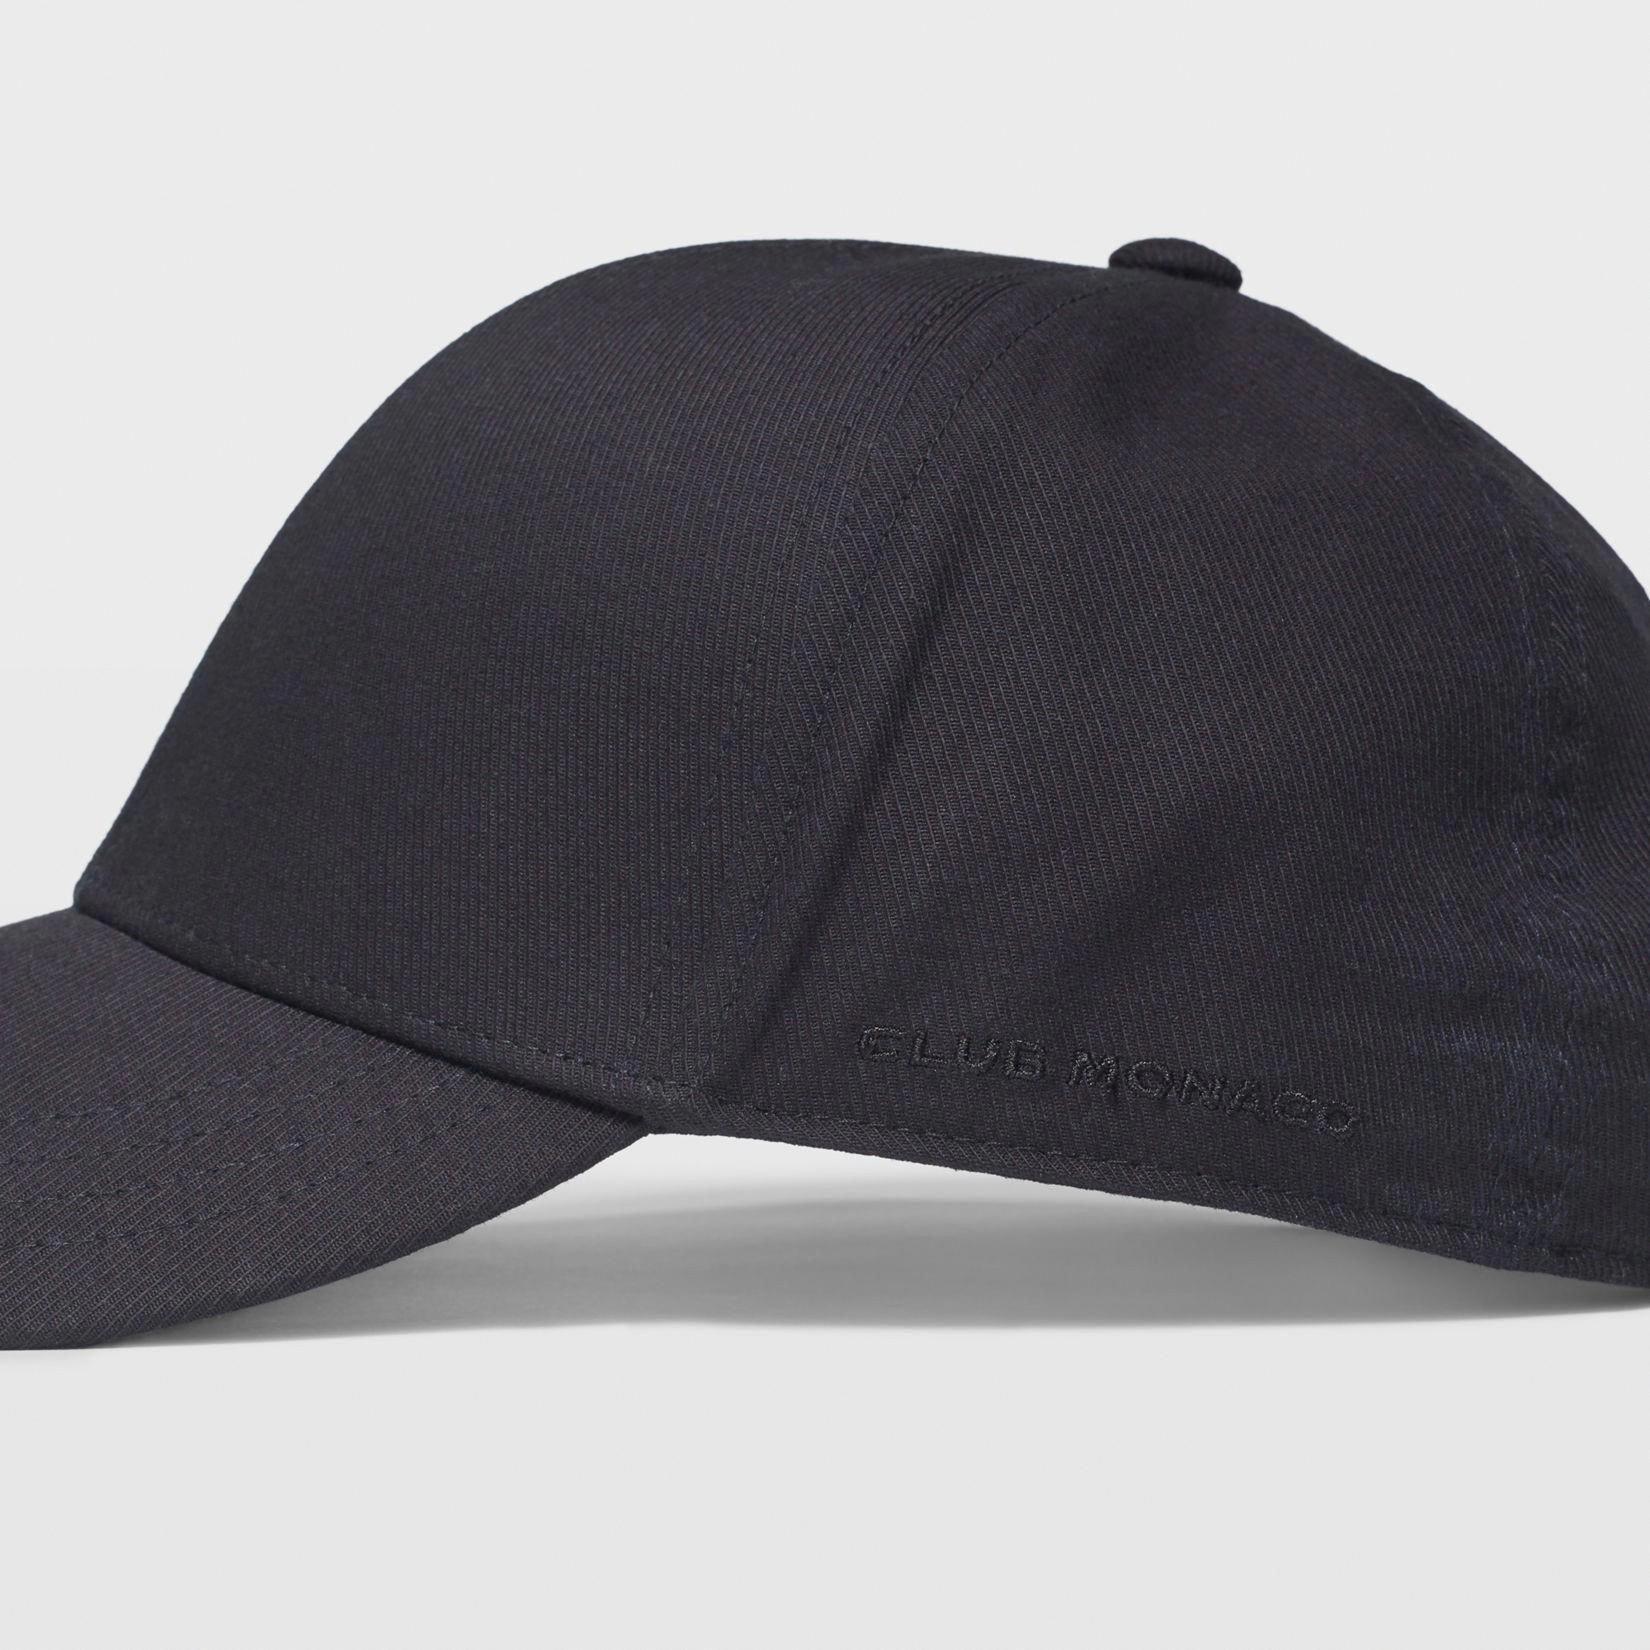 ac21f9fdb464d Club Monaco Cotton Twill Baseball Hat - Black One Size  baseballcaps   fsubaseballschedule